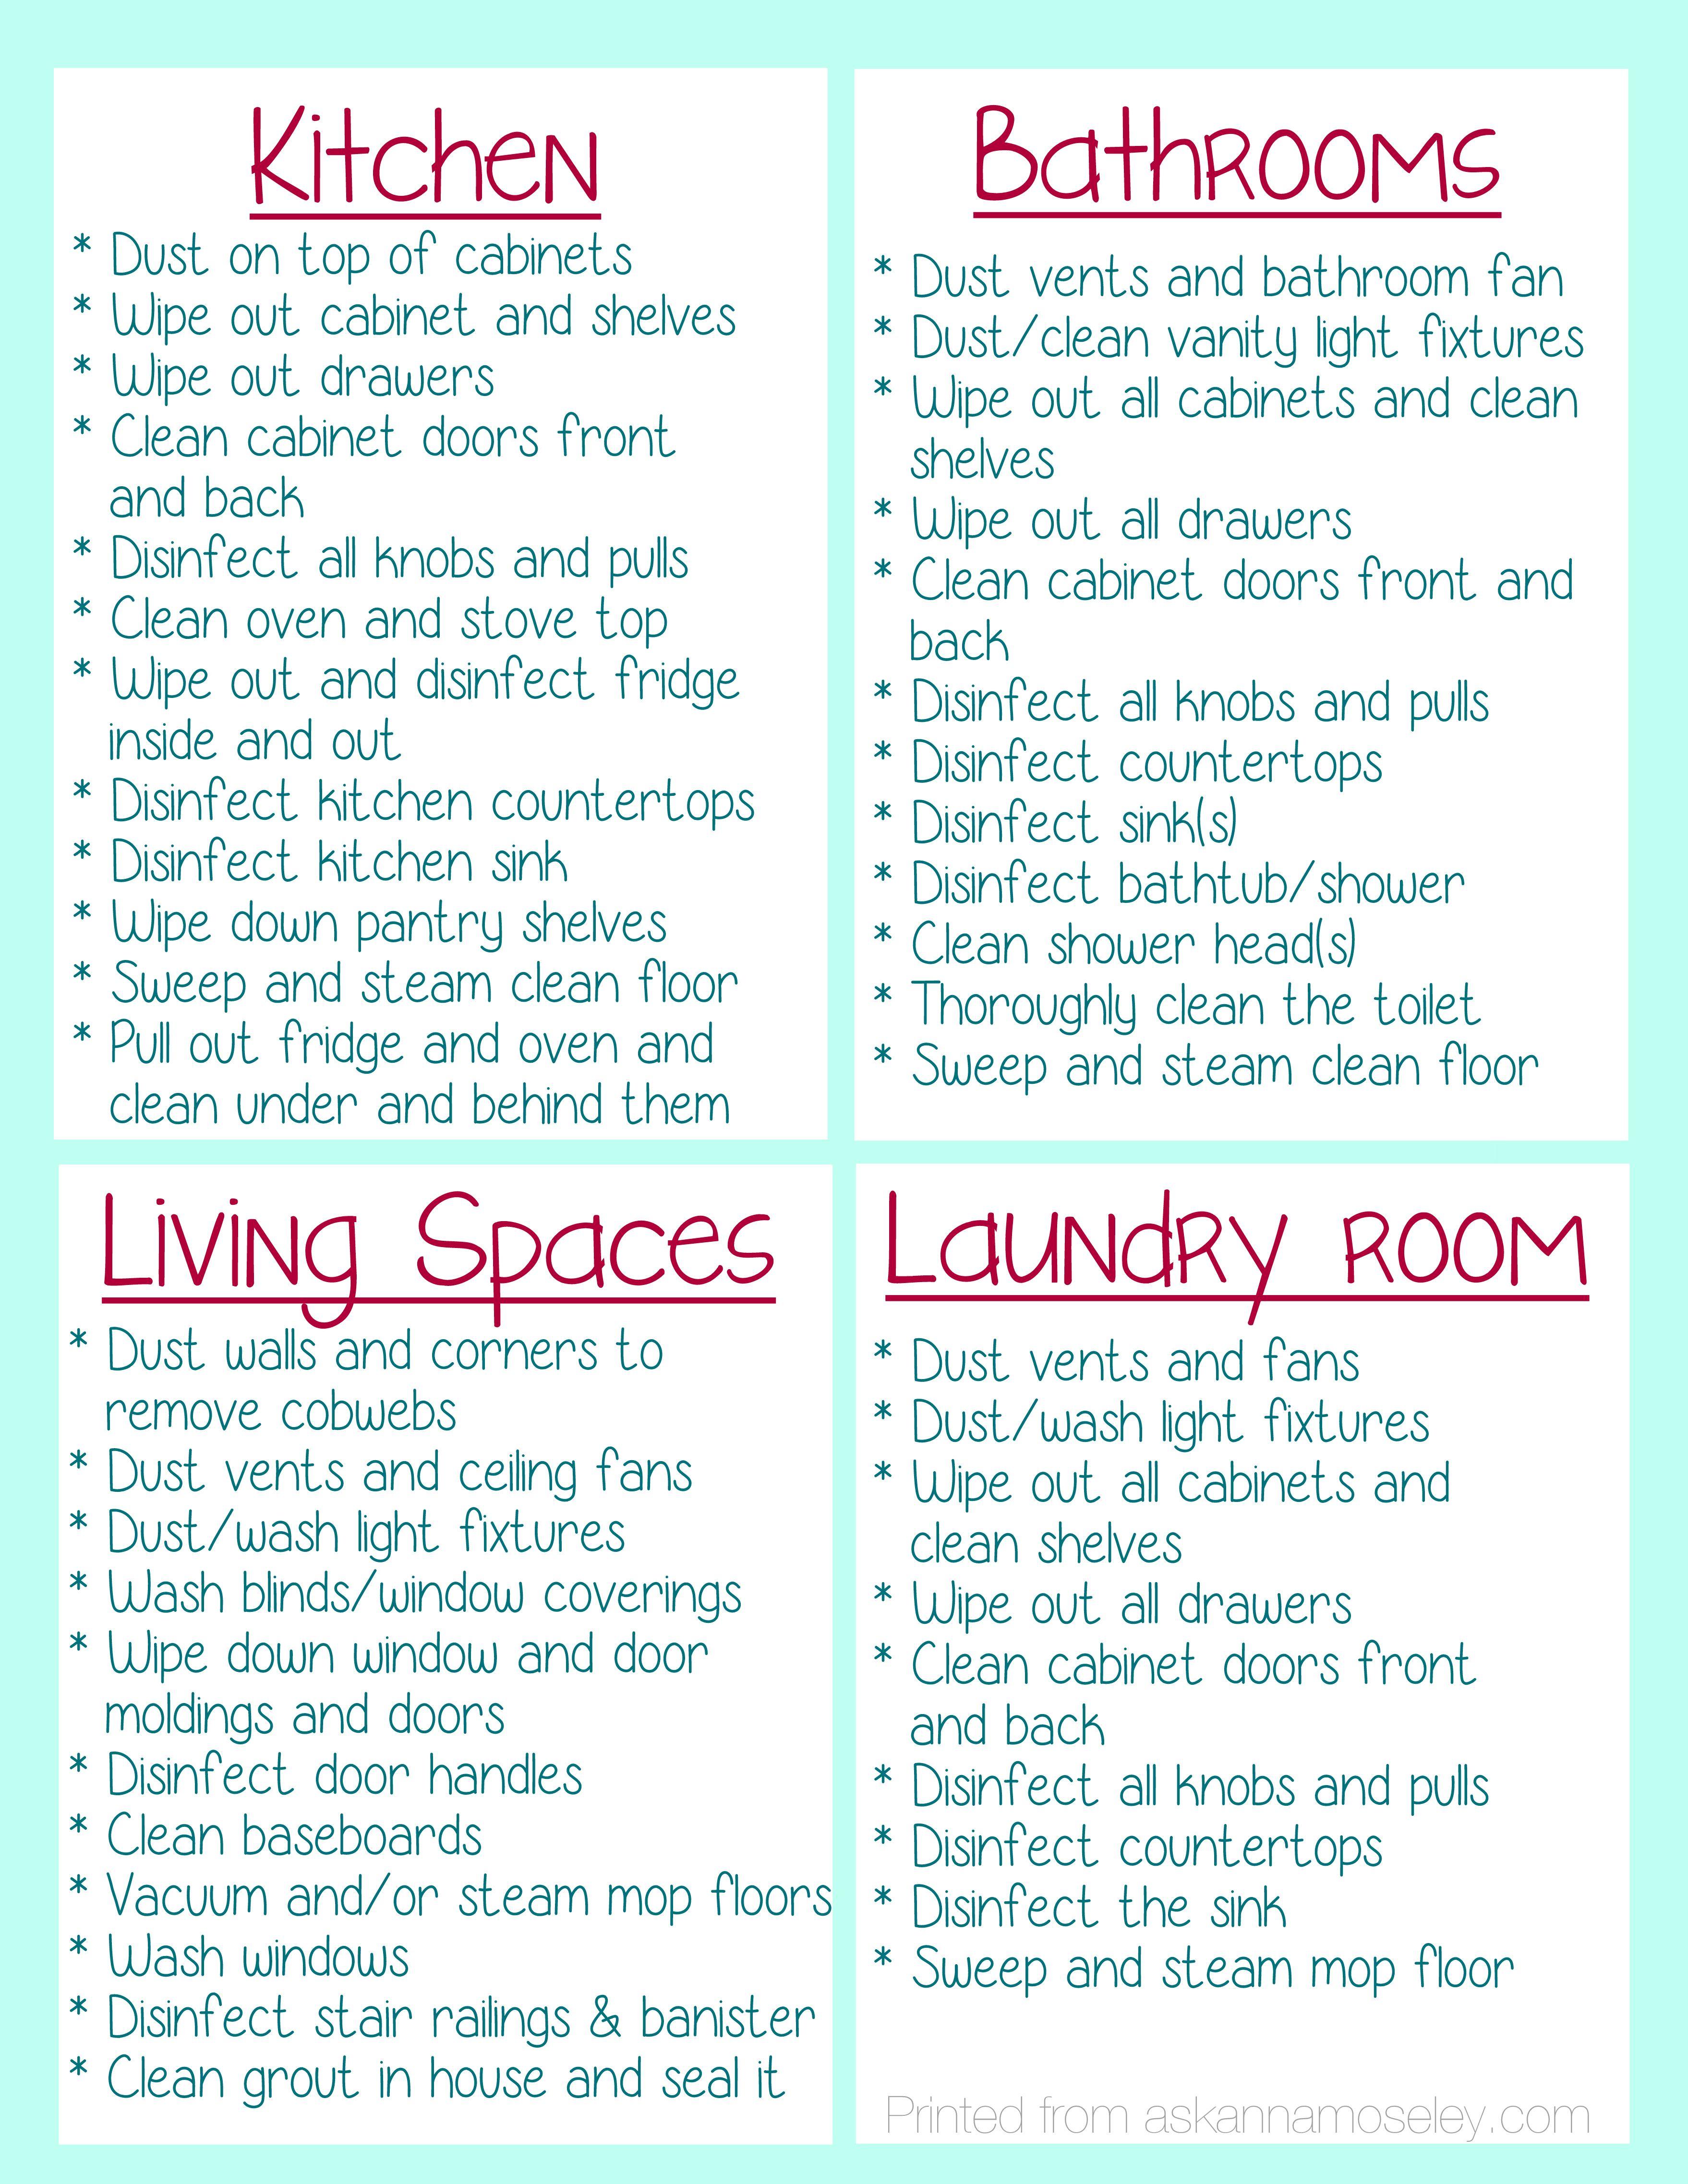 Apartment Comparison Checklist | charlotte clergy coalition